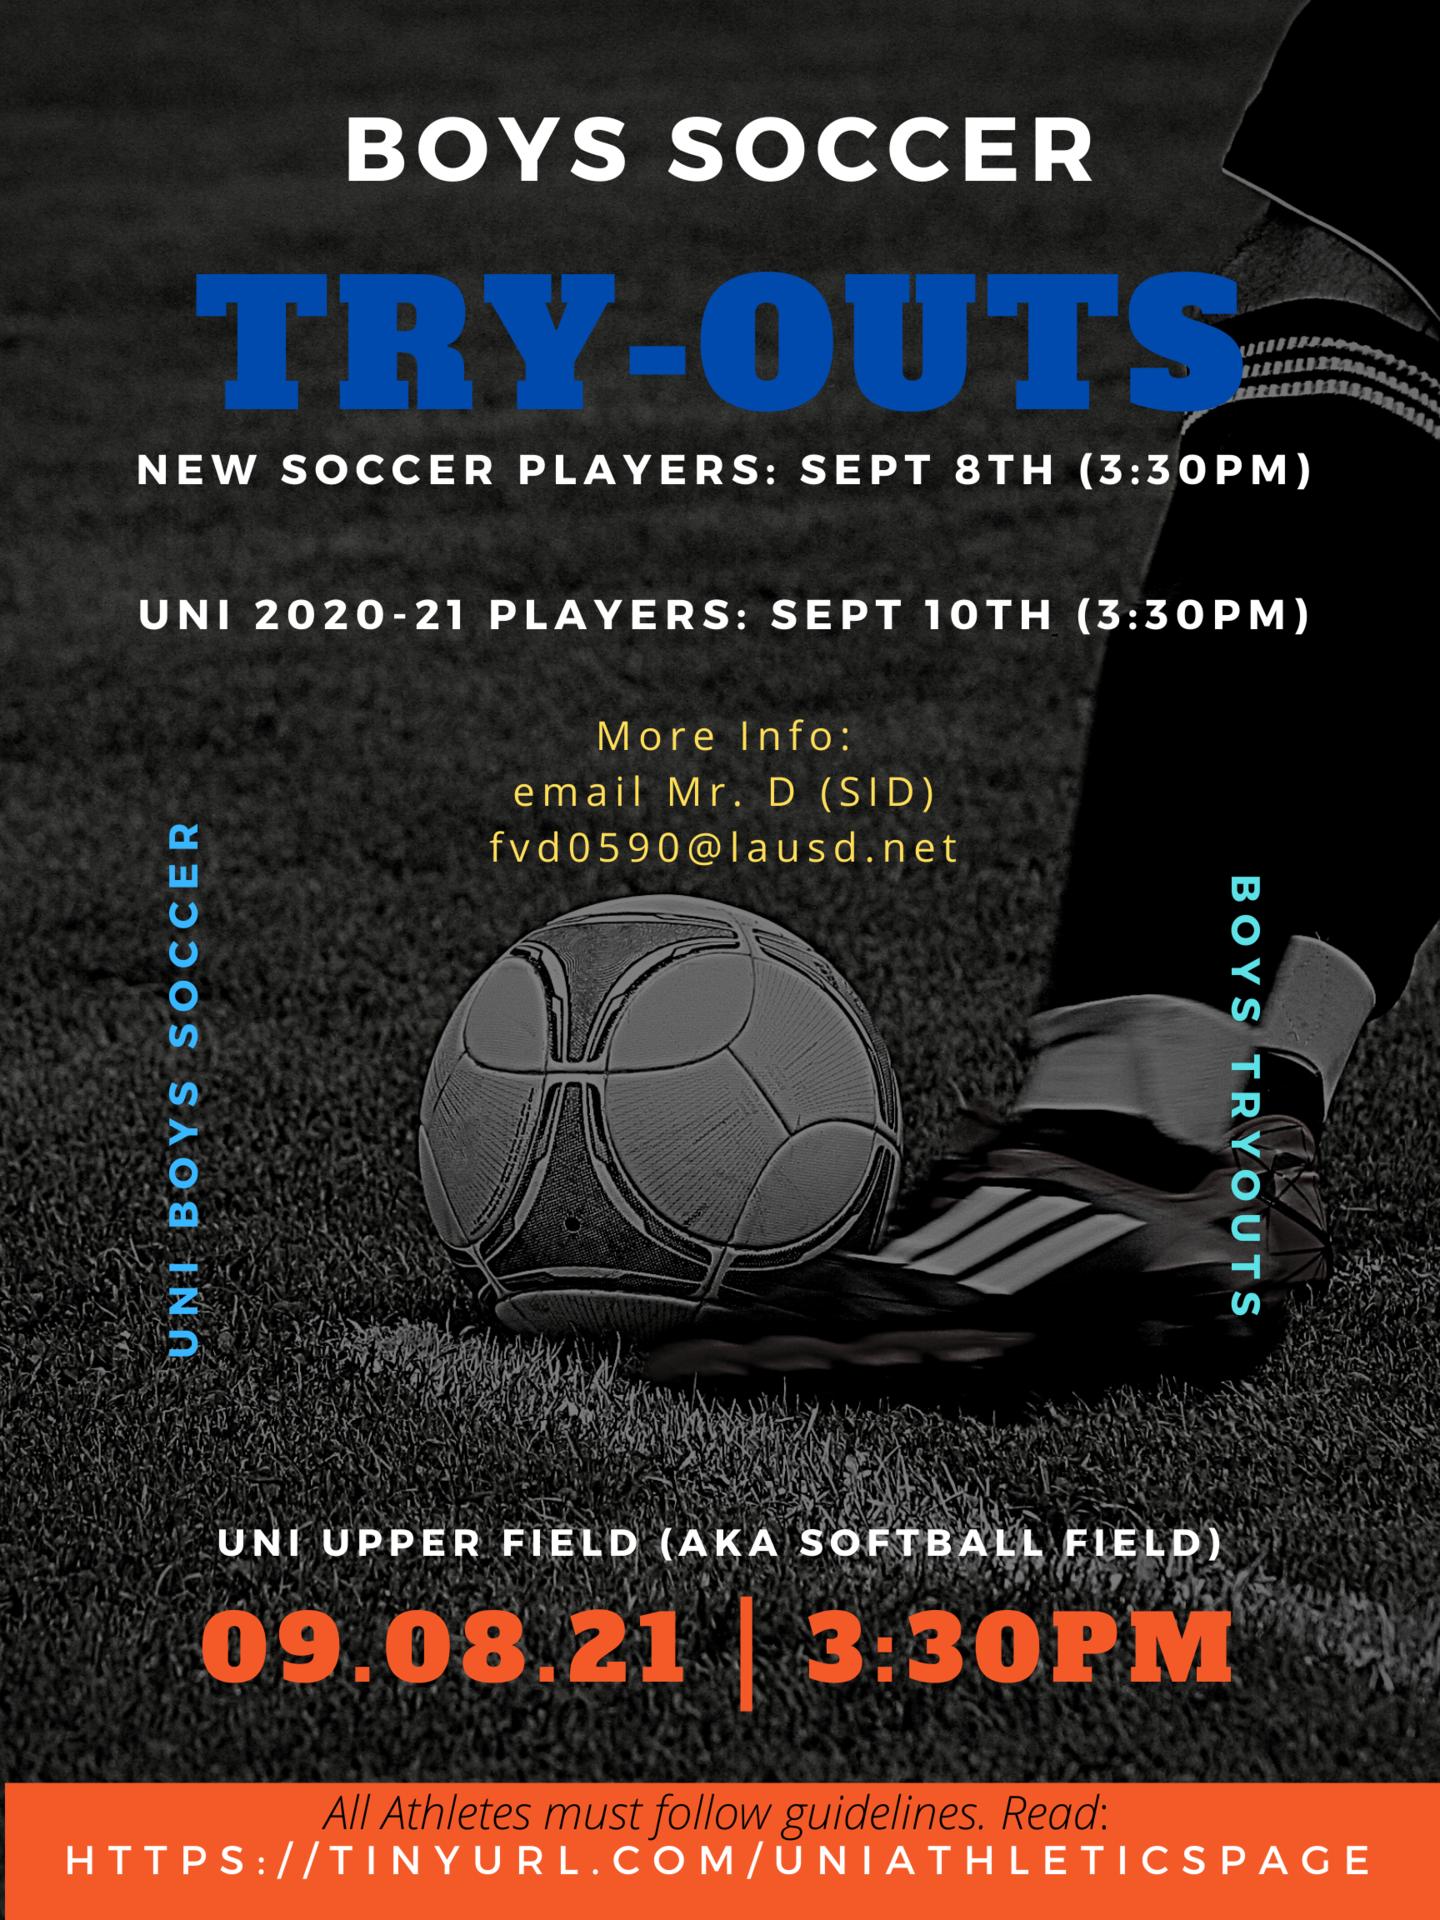 Boys Soccer tryouts - fall 2021